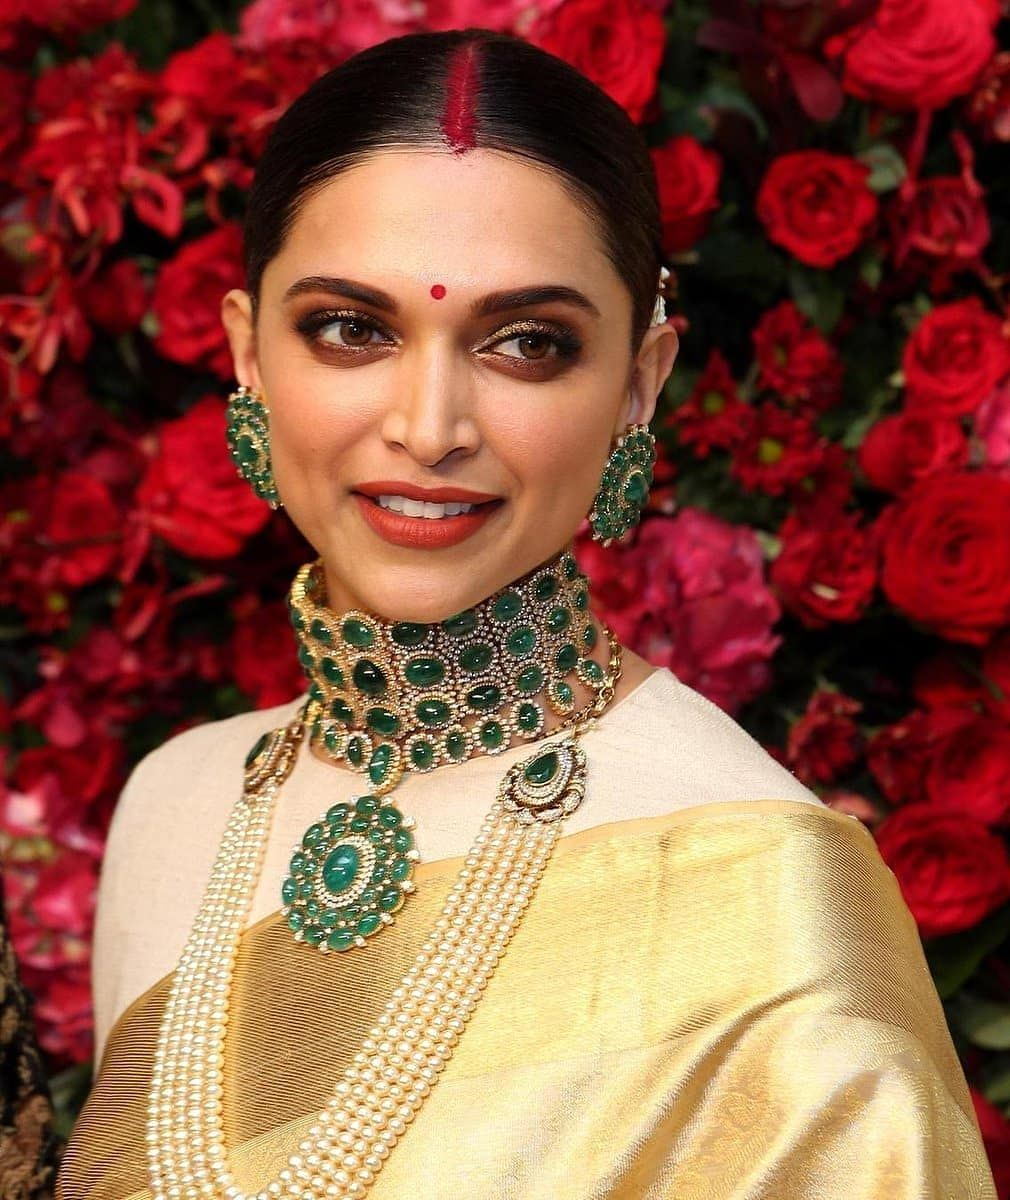 The classy bride Deepika Padukone ️ ...